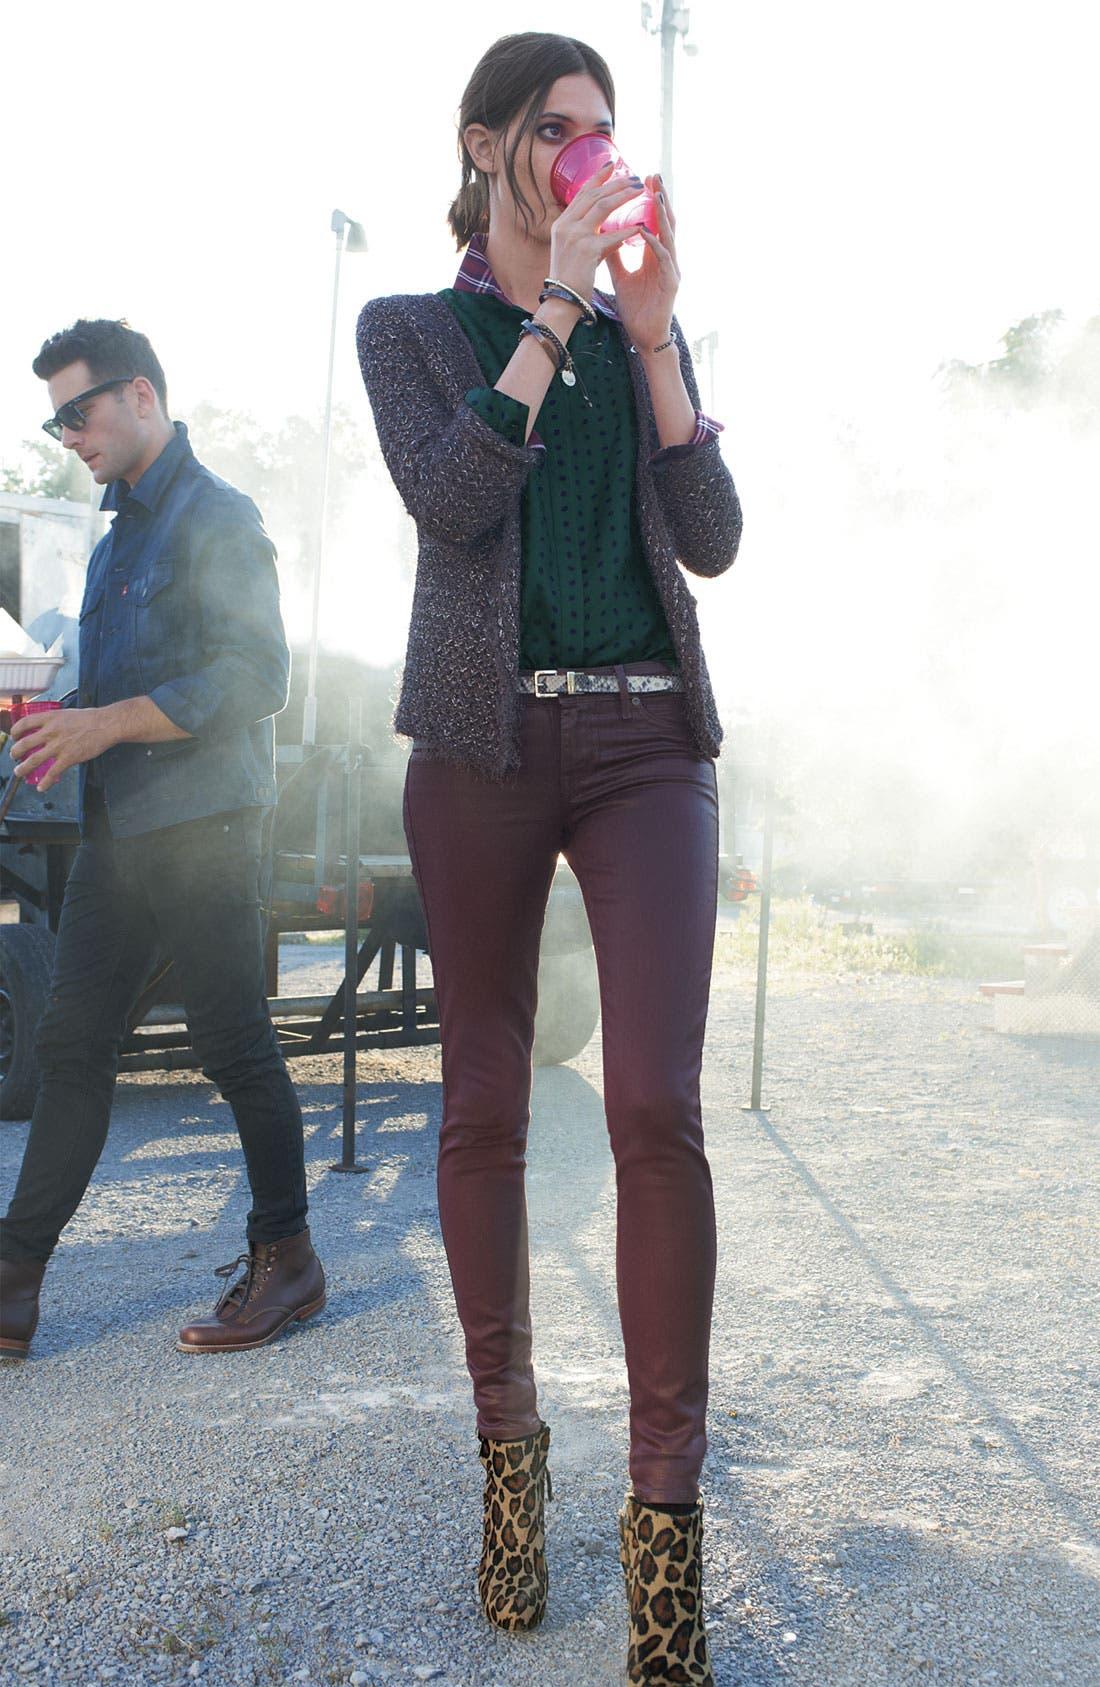 Main Image - Plastic Island Cardigan, Gibson Shirt & Rich & Skinny Jeans